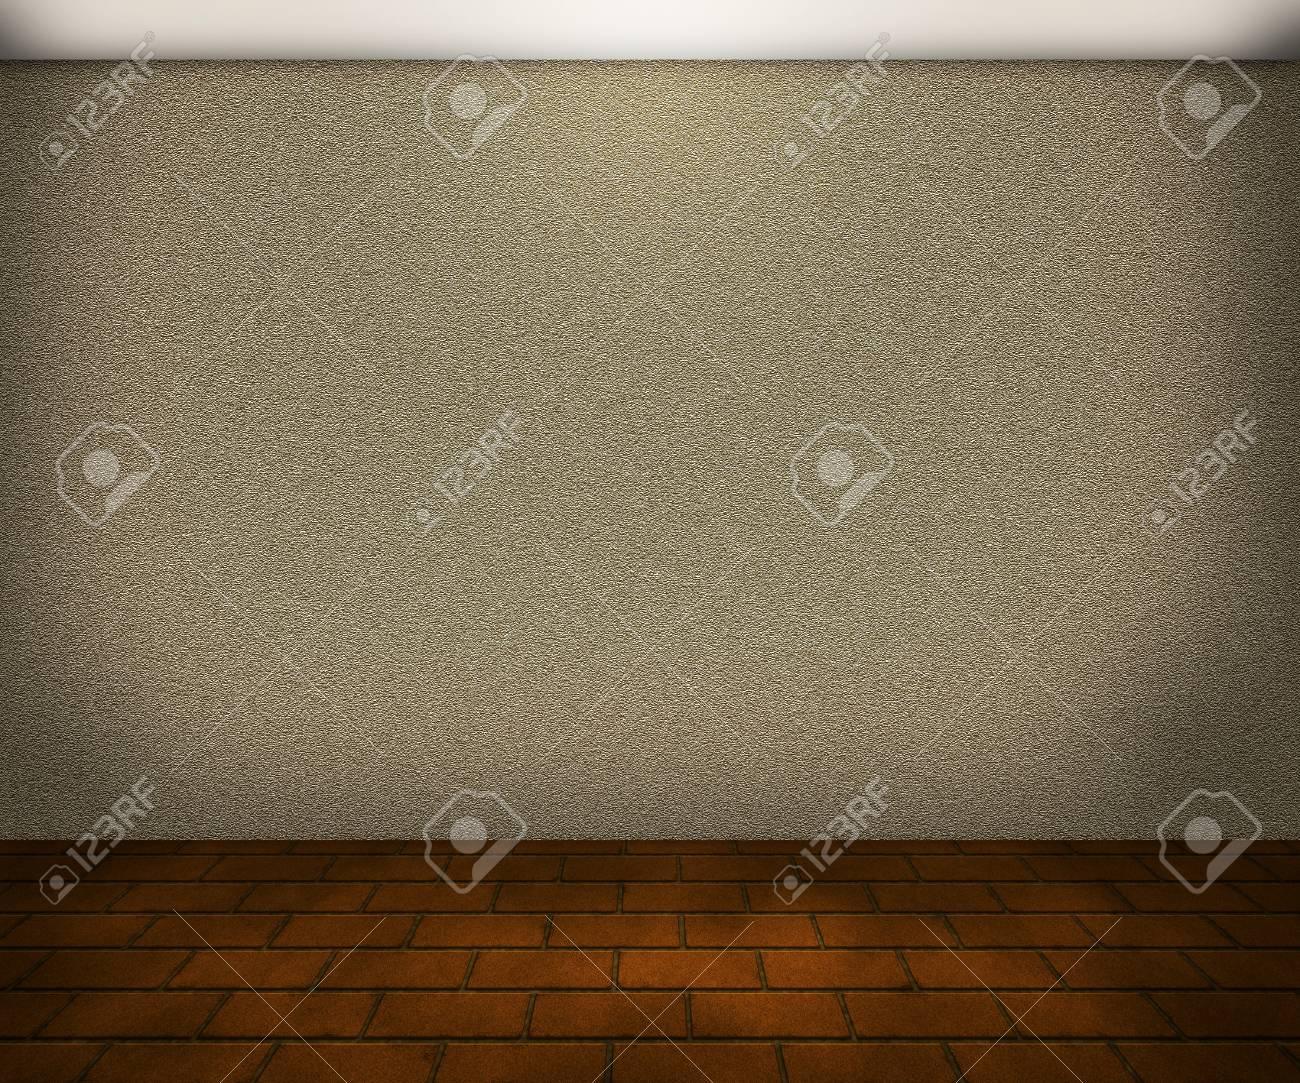 Room Background Stock Photo - 14587123